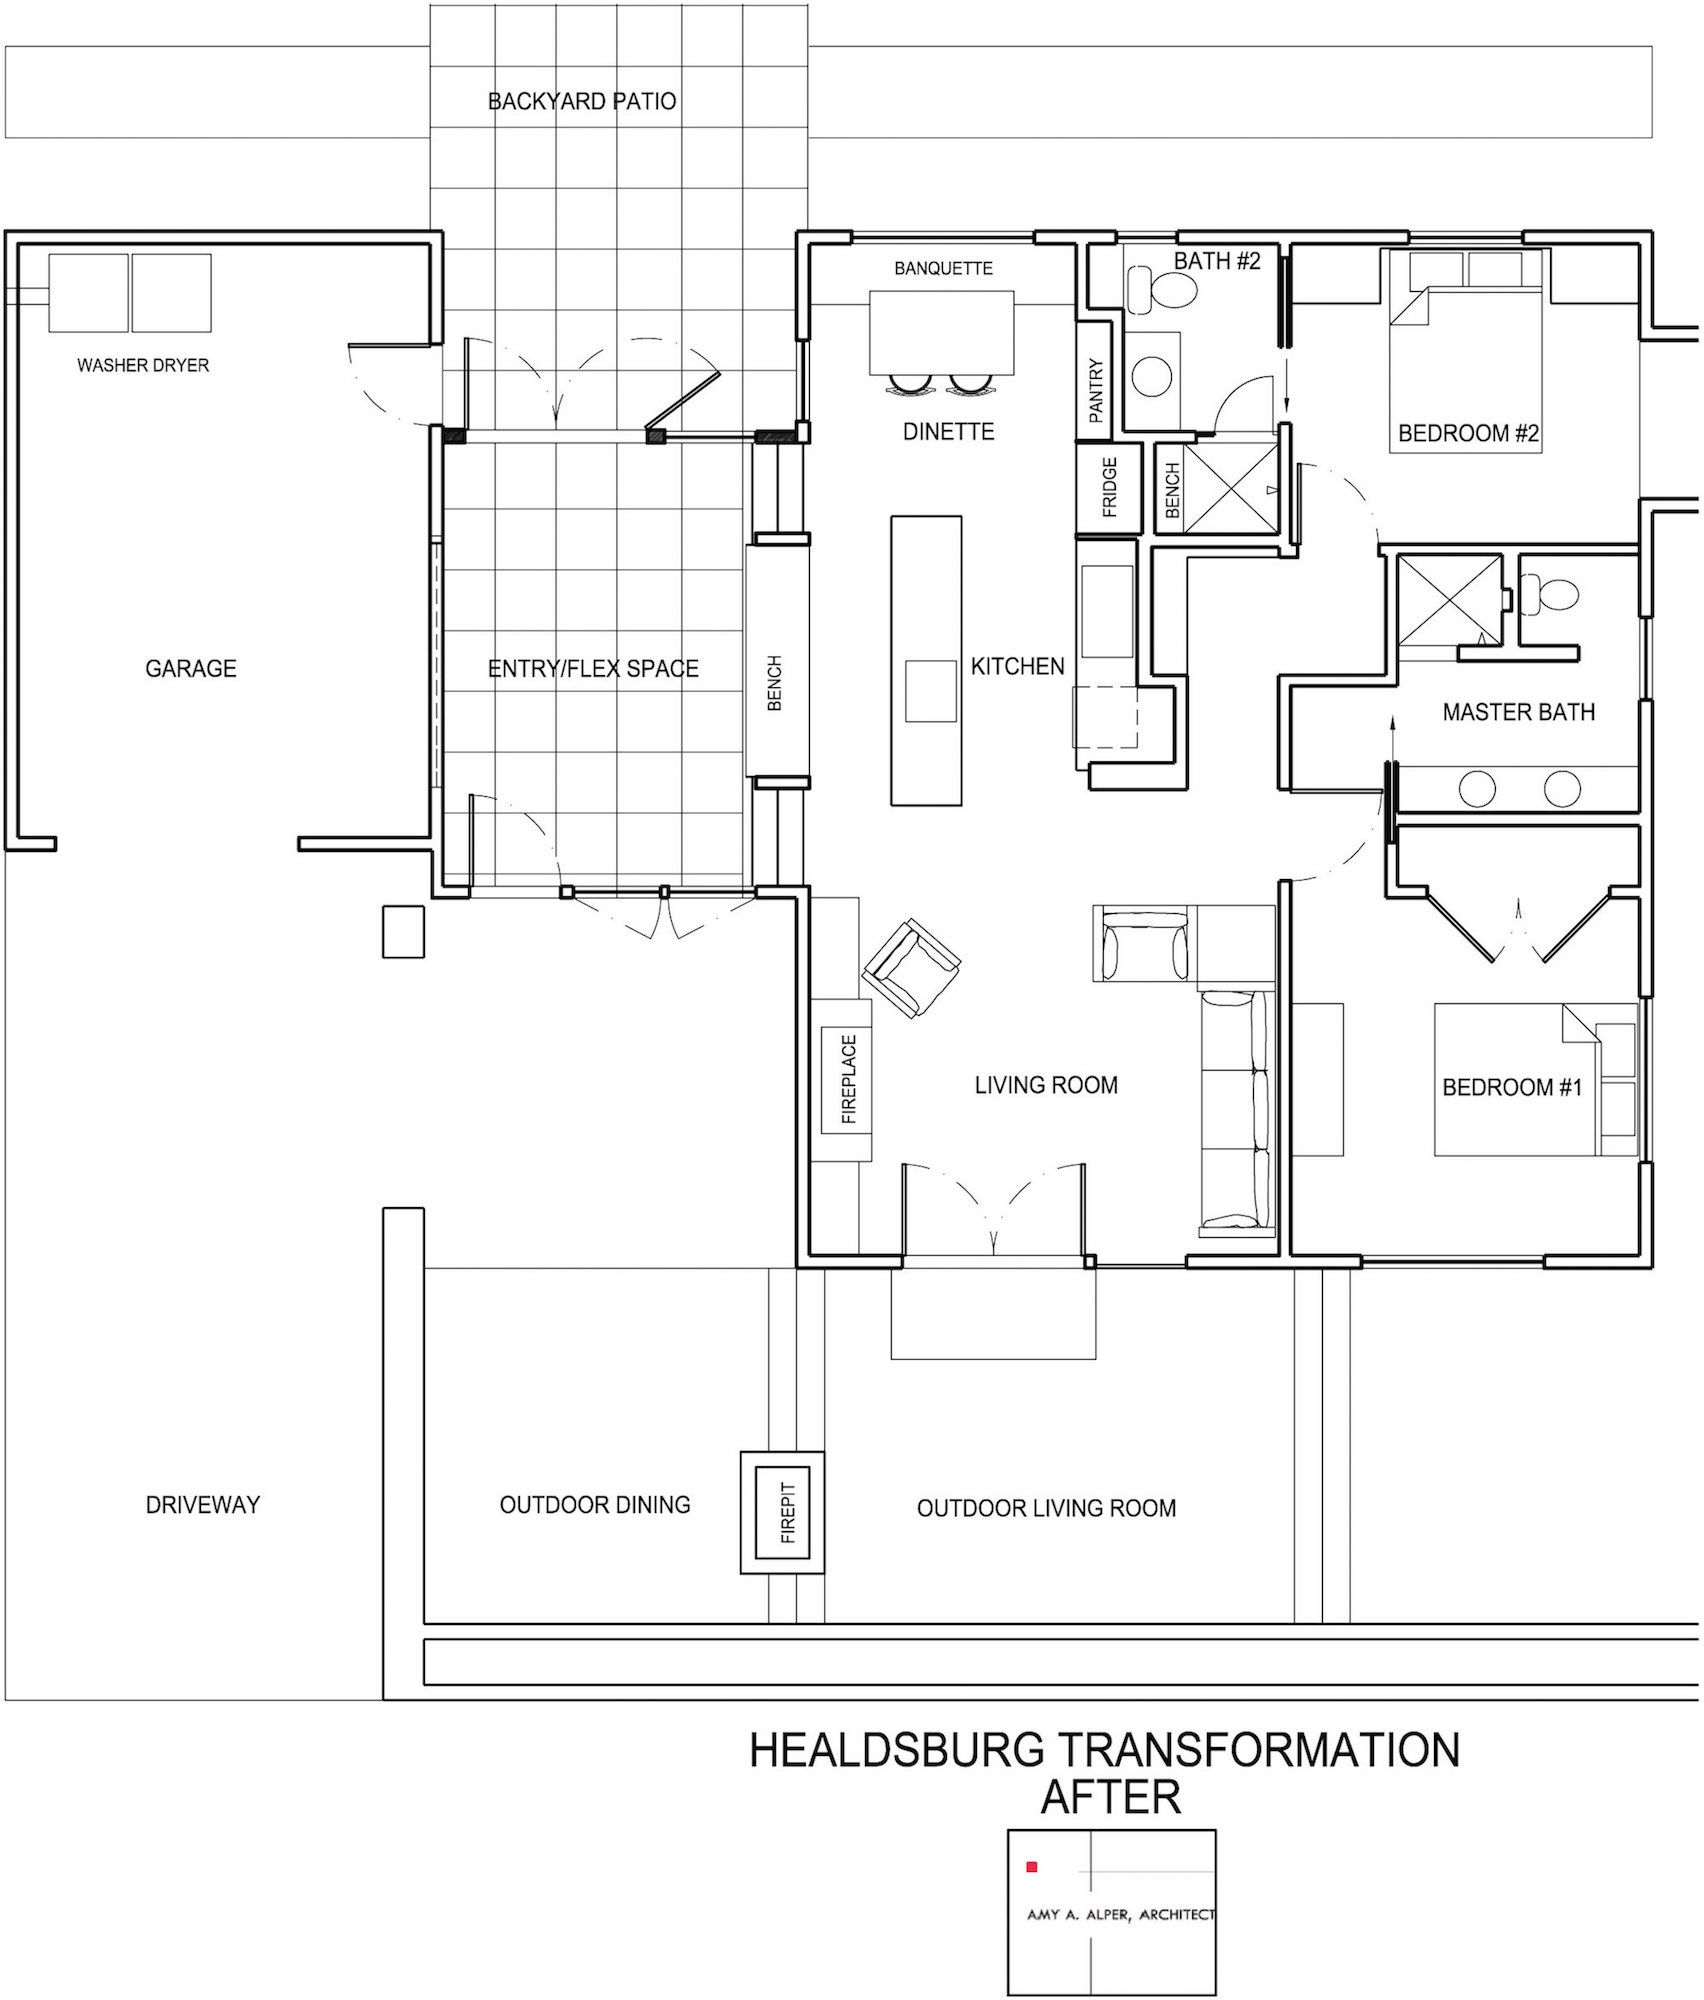 Healdsburg-Transformation-20